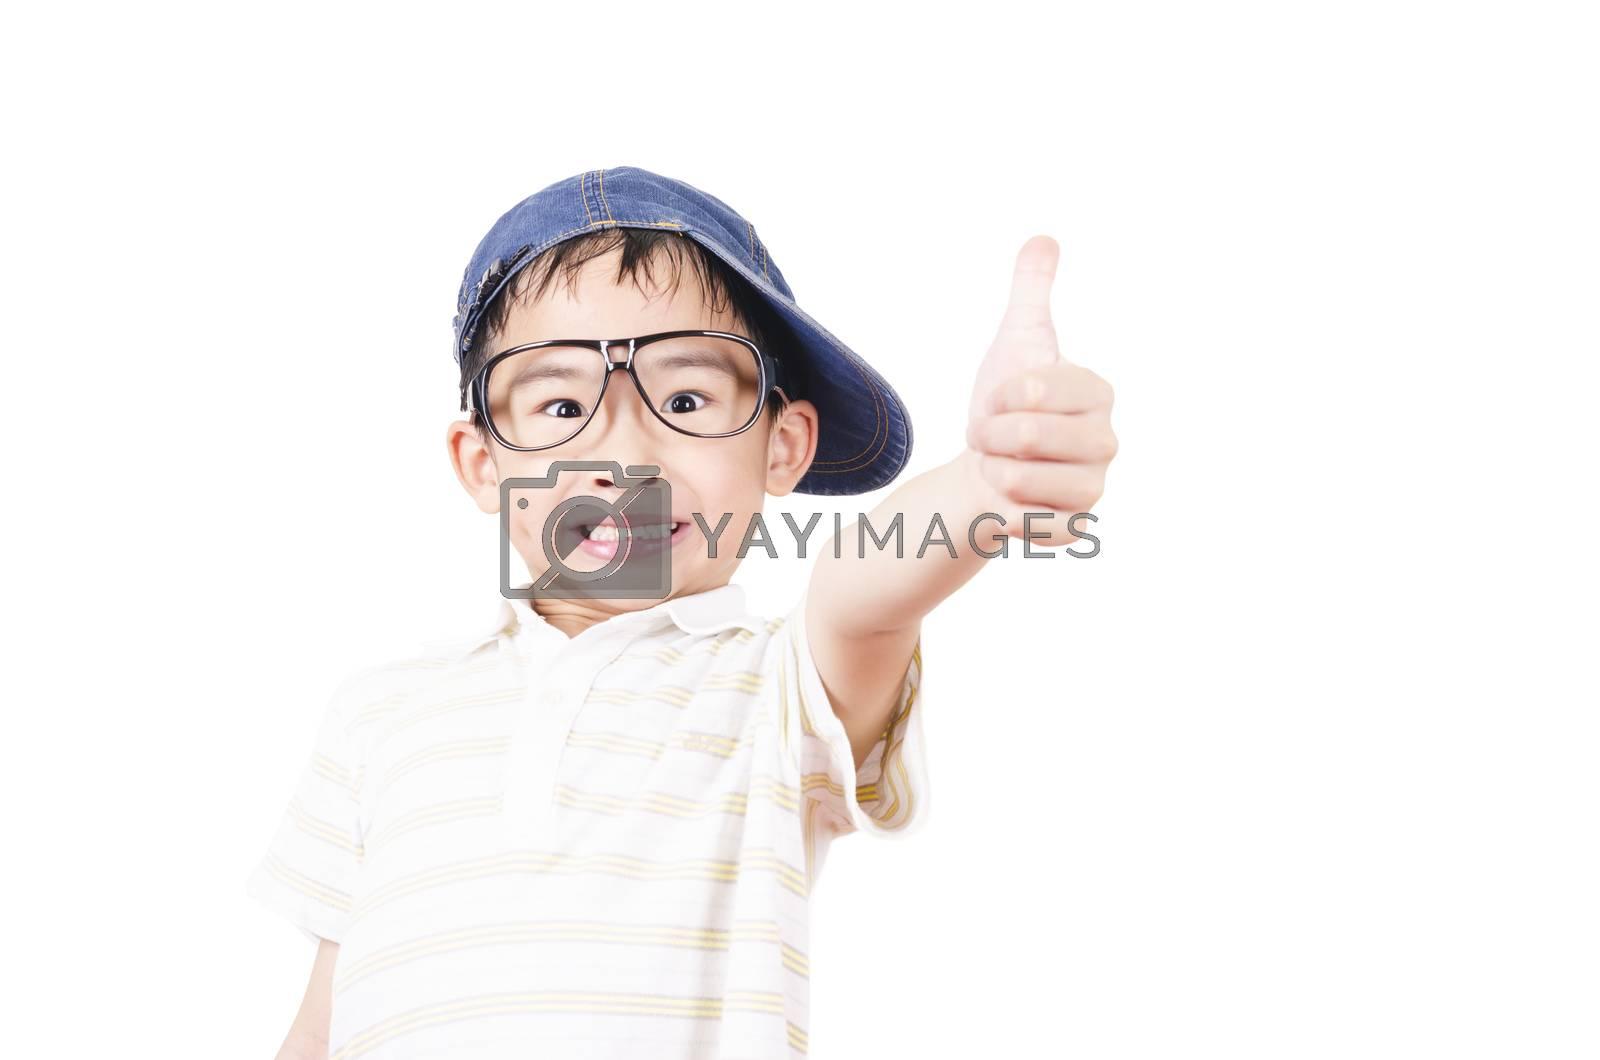 Royalty free image of Joyful little boy holding his thumb up by FrankyLiu